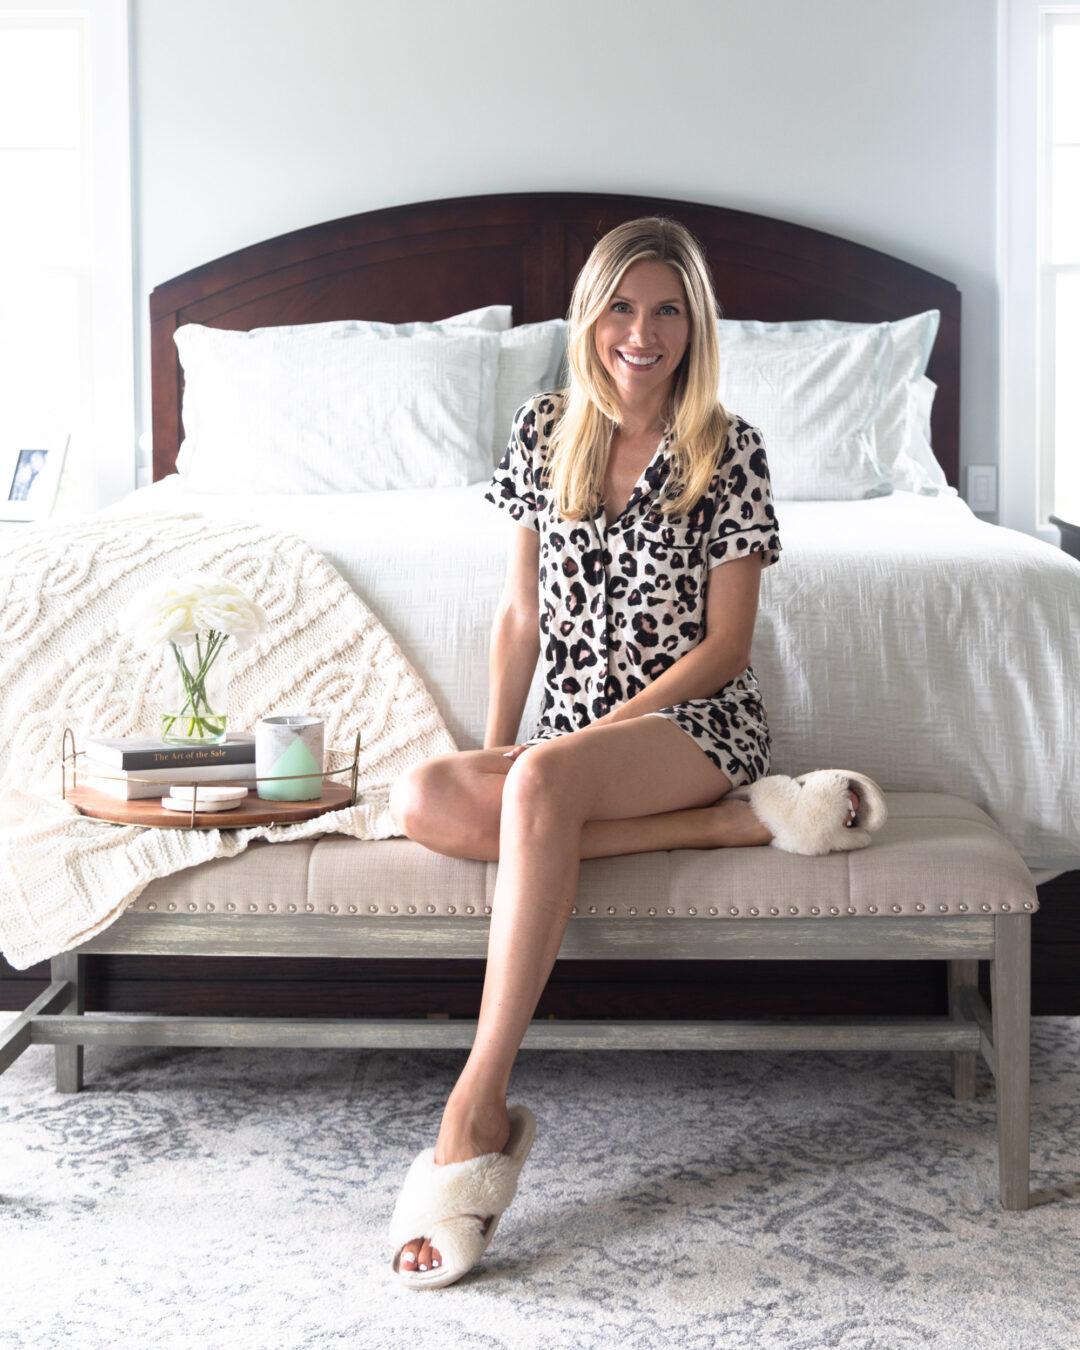 fieldcrest-cozy-duvet-bedding-the-glamorous-gal